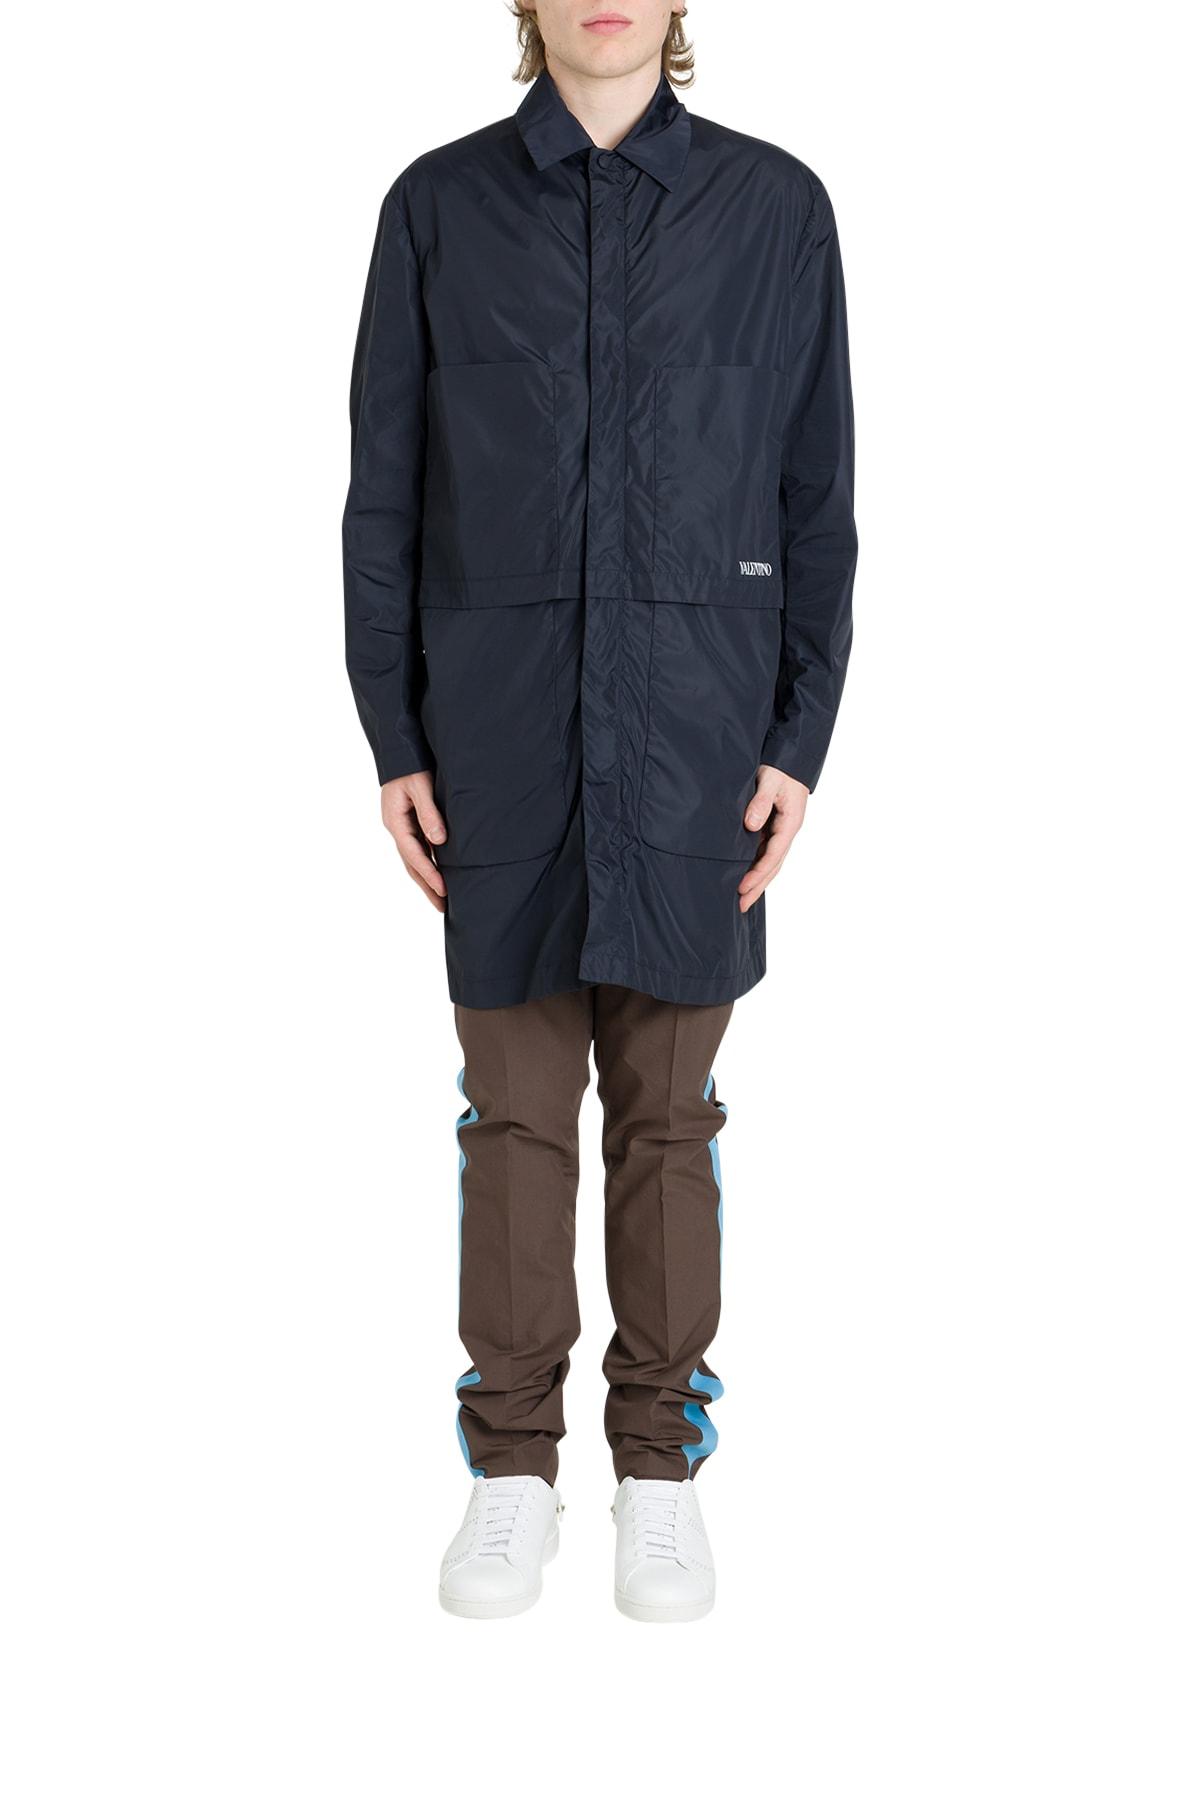 Valentino Nylon Jacket With Logo Print